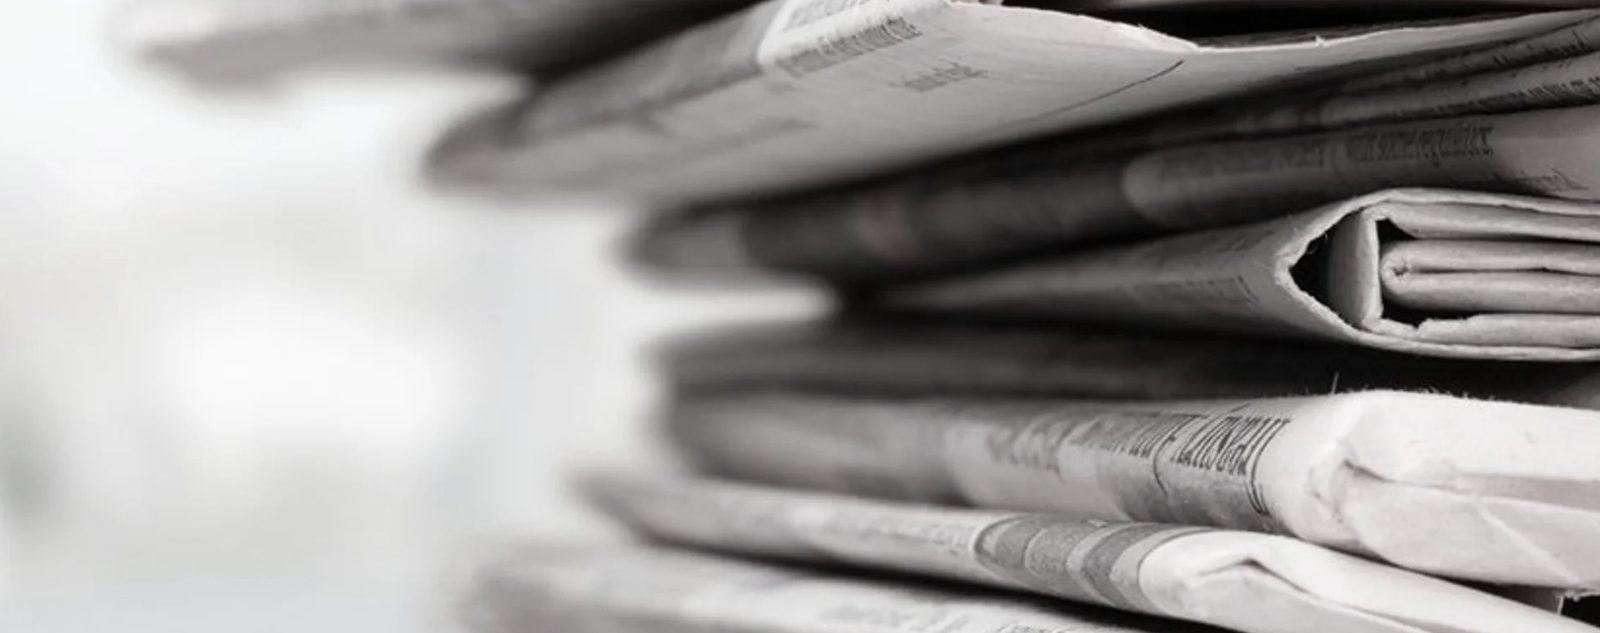 Axius News